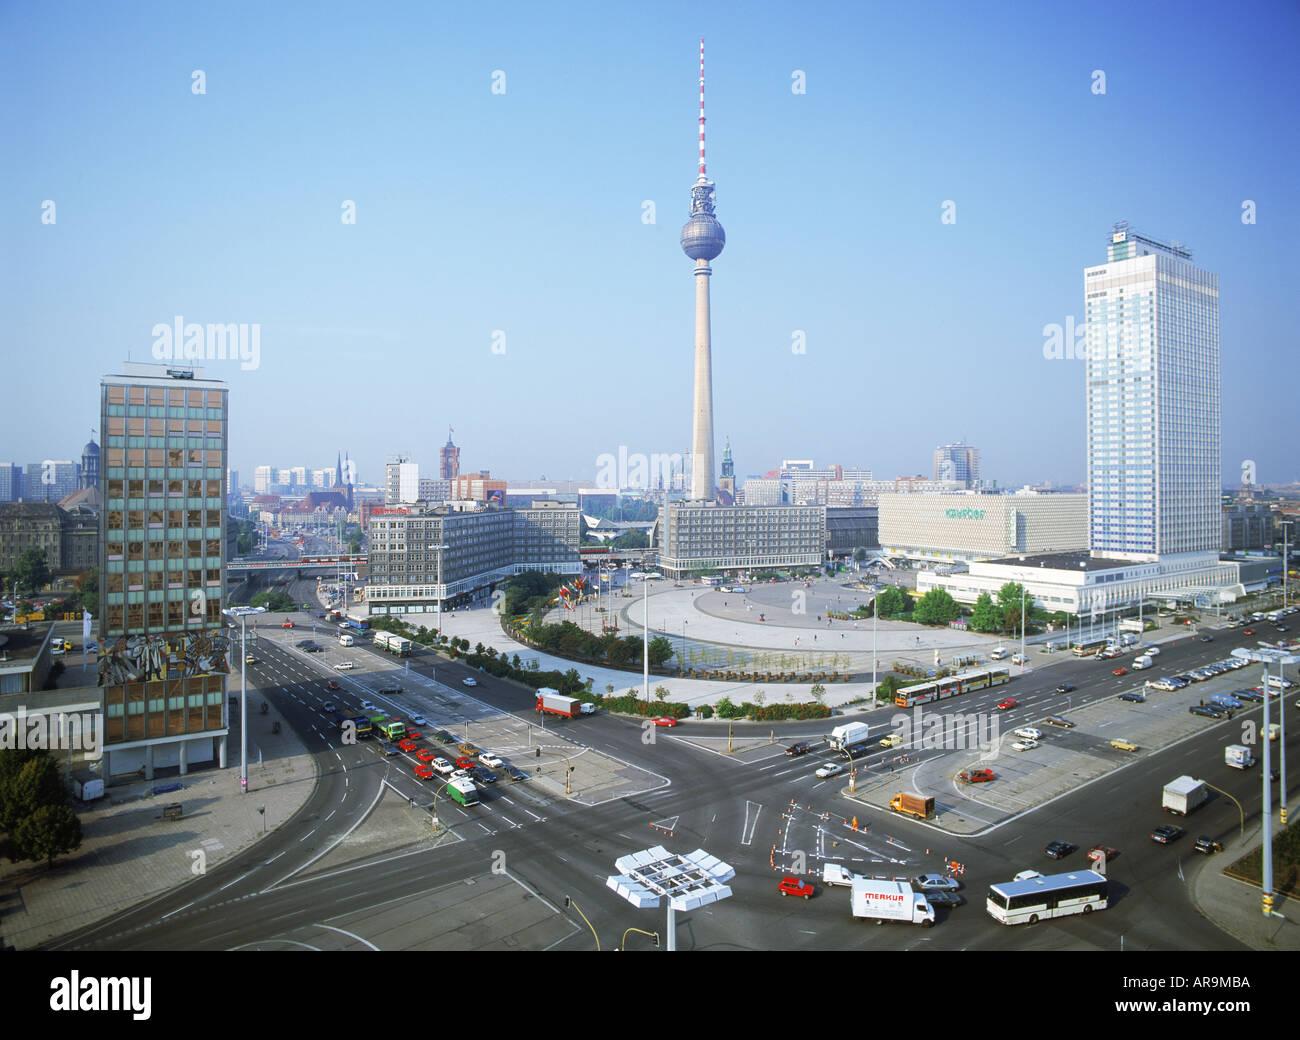 fernsehturm tv tower at